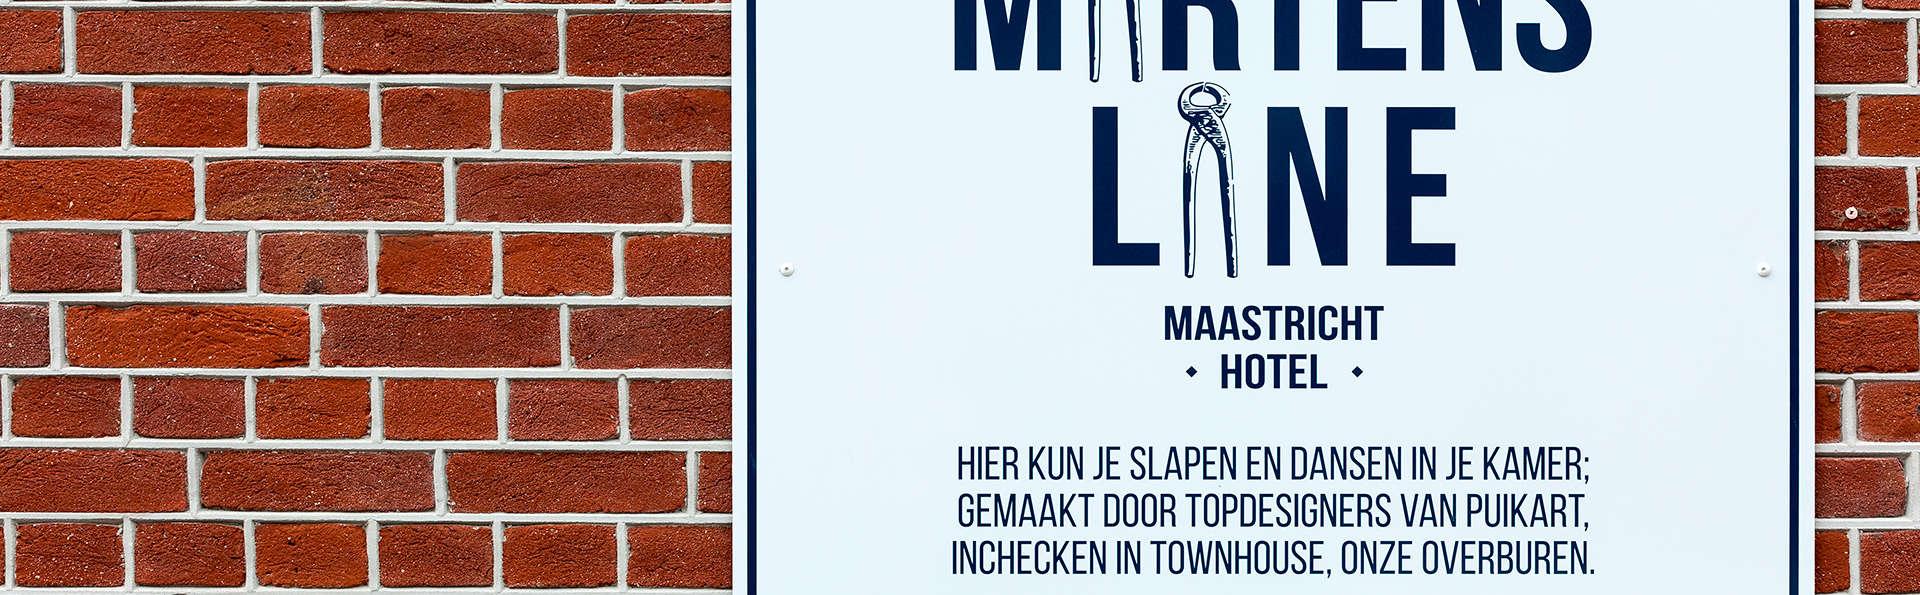 St. Martenslane Maastricht - edit_exterior2.jpg